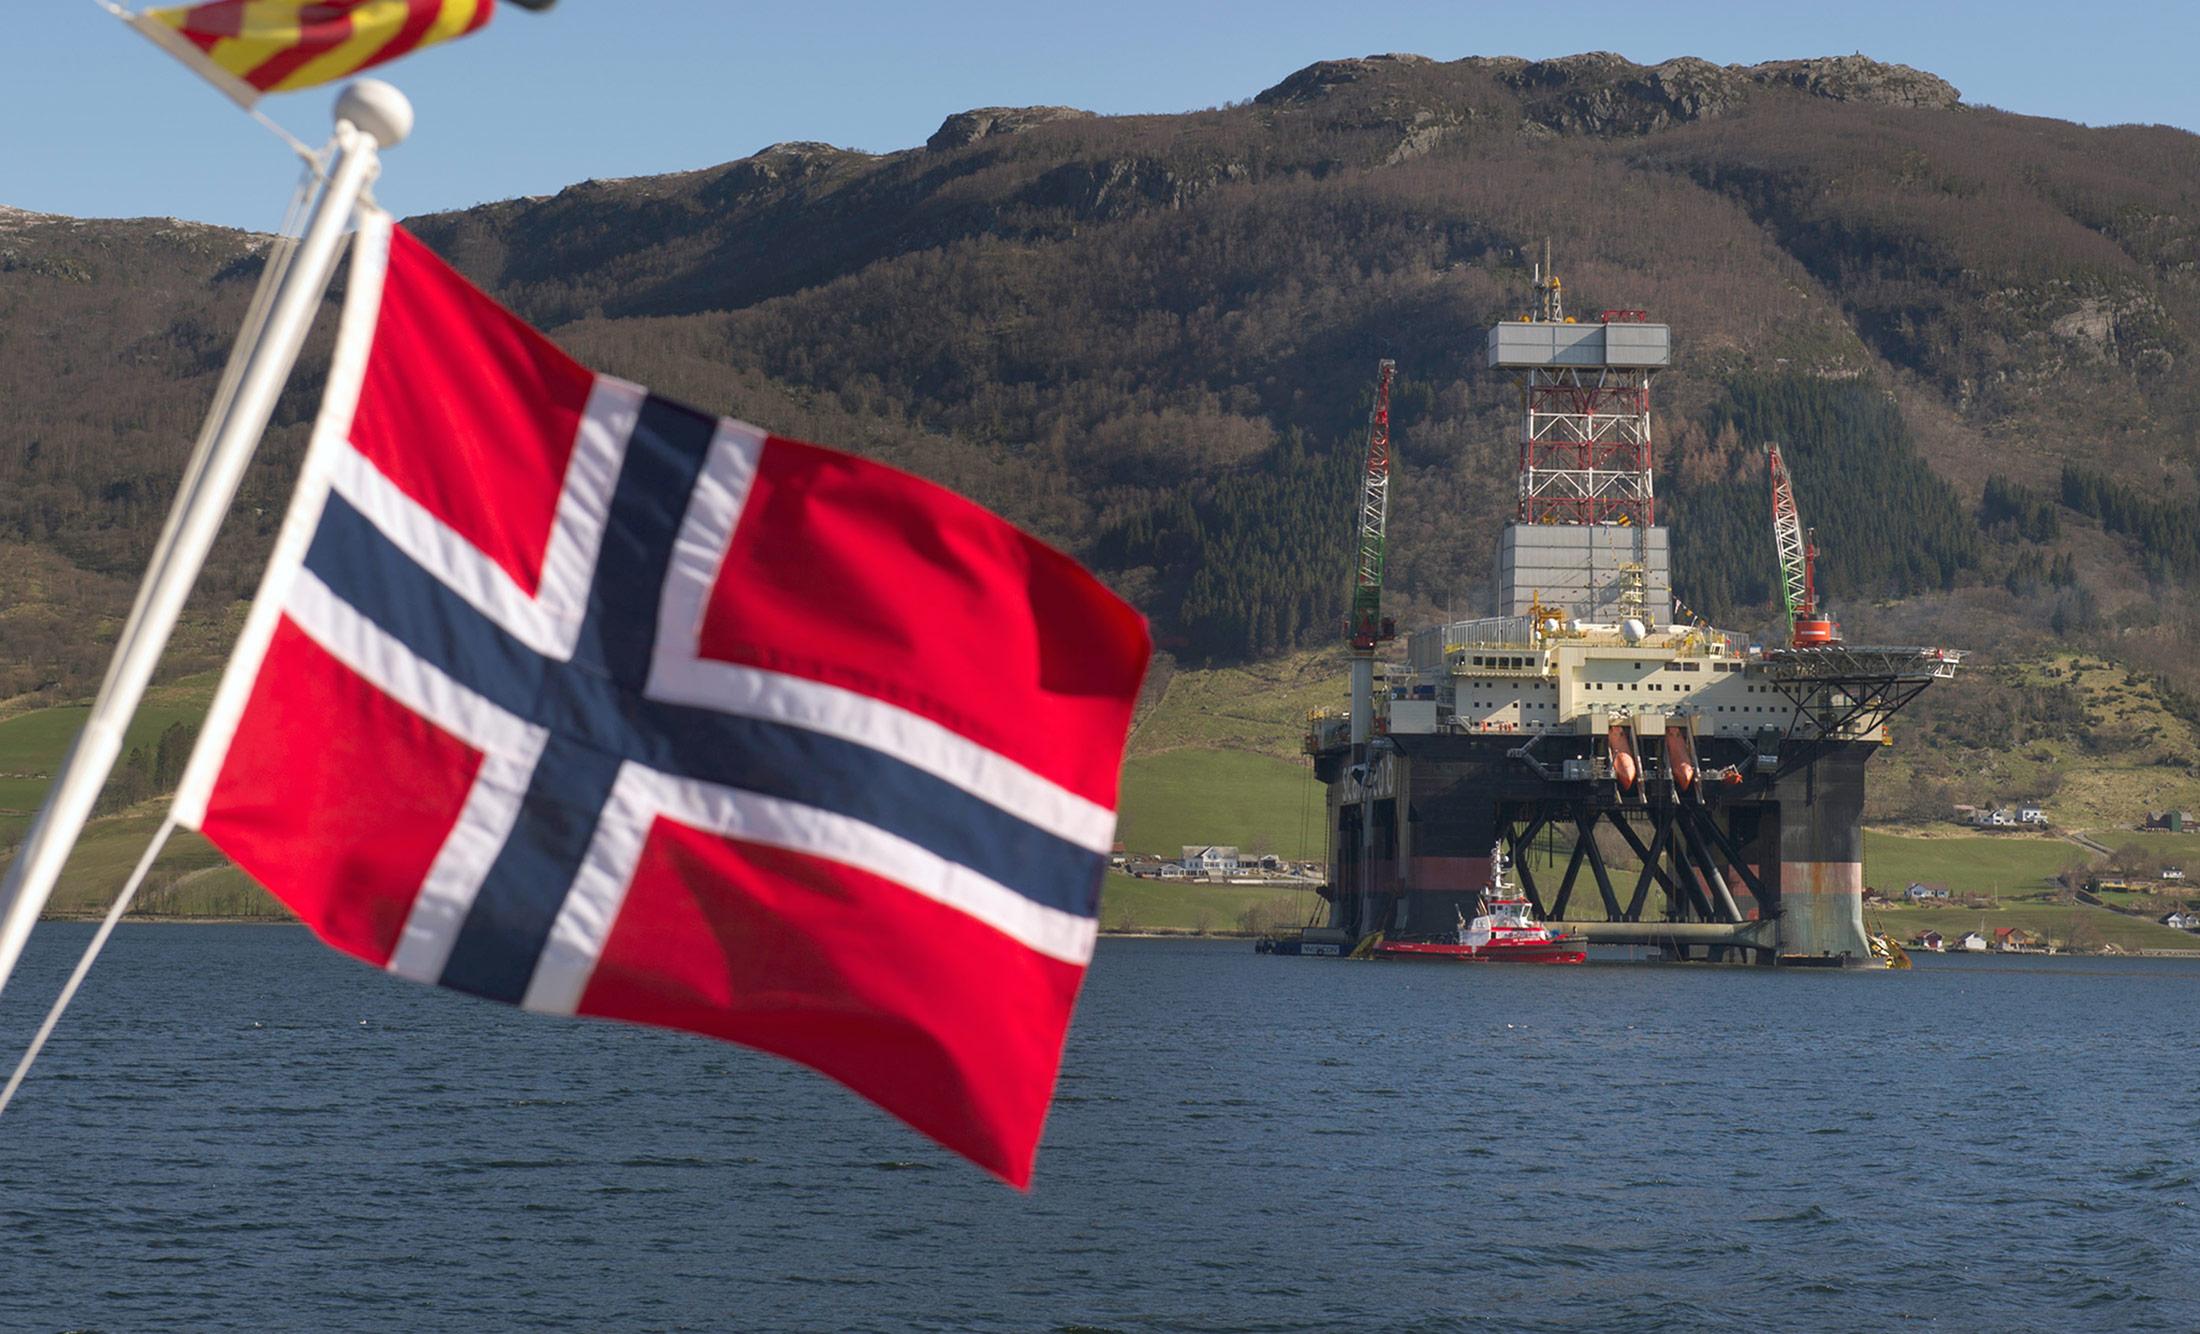 Norway oil workers agree wage deal, ending threat of strike